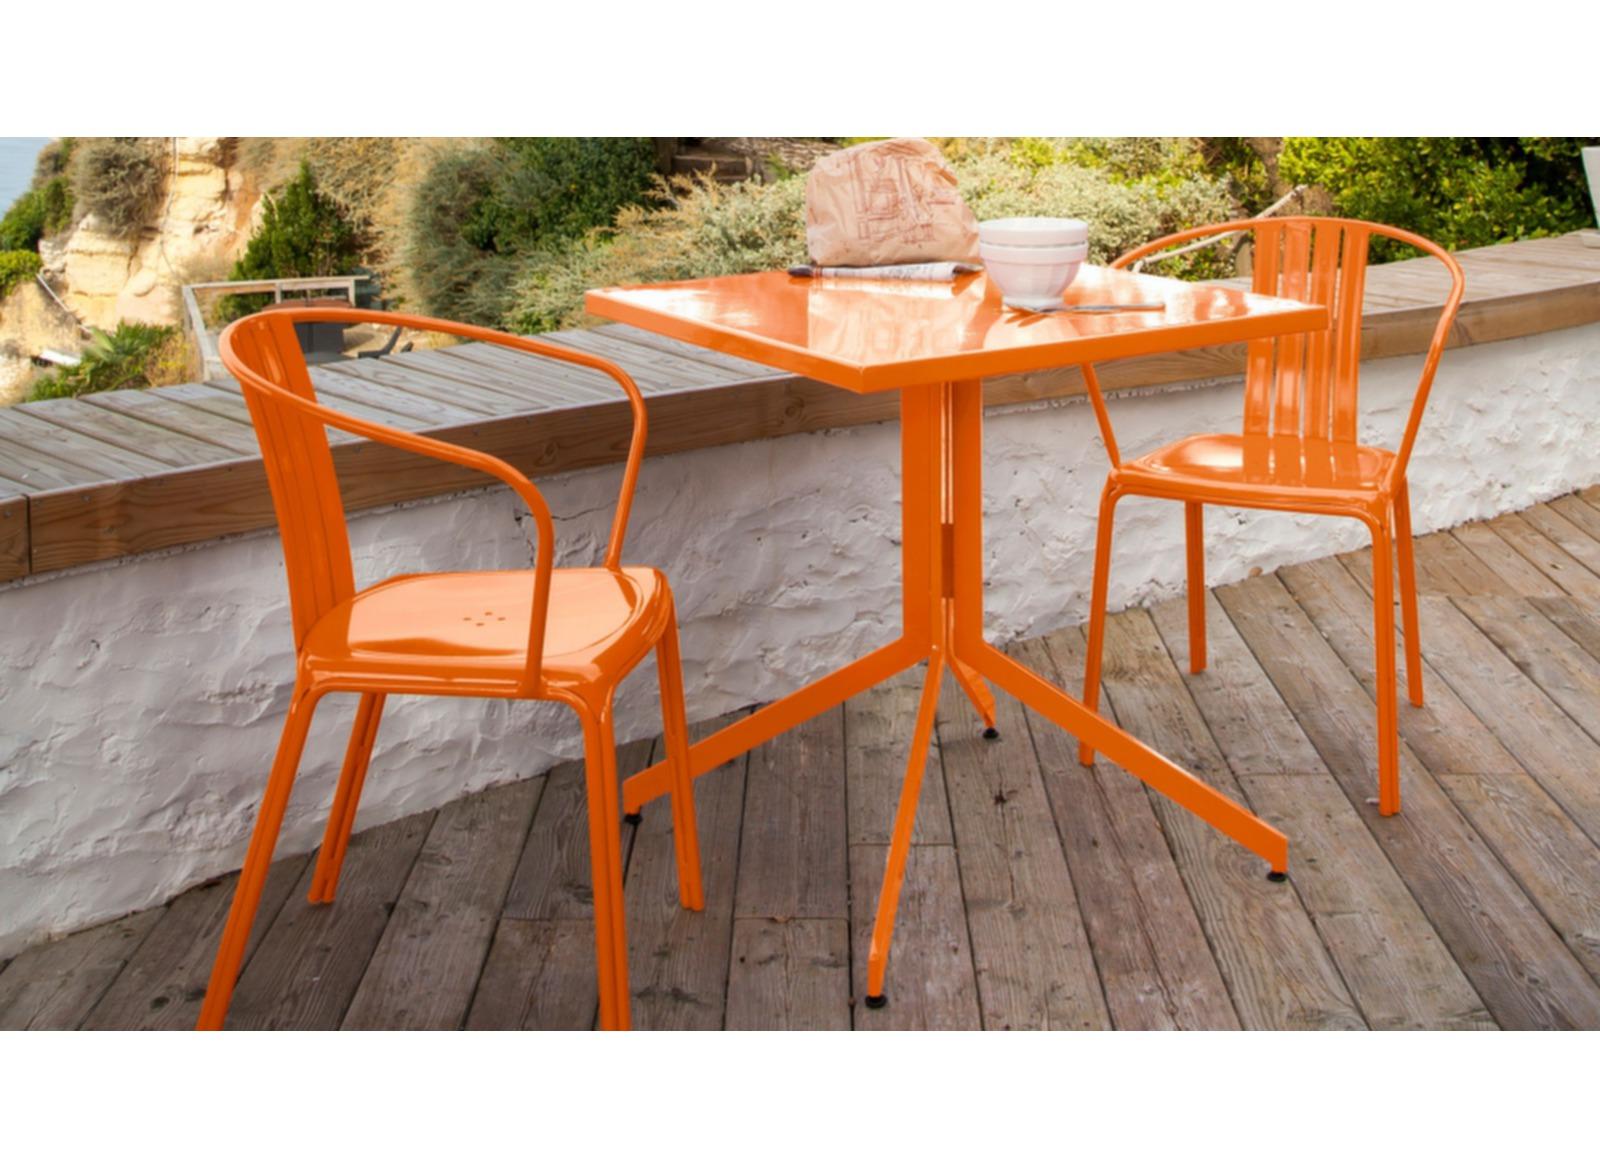 gu ridon urban 70 cm gu ridons petites tables de jardin mobilier de jardin proloisirs. Black Bedroom Furniture Sets. Home Design Ideas